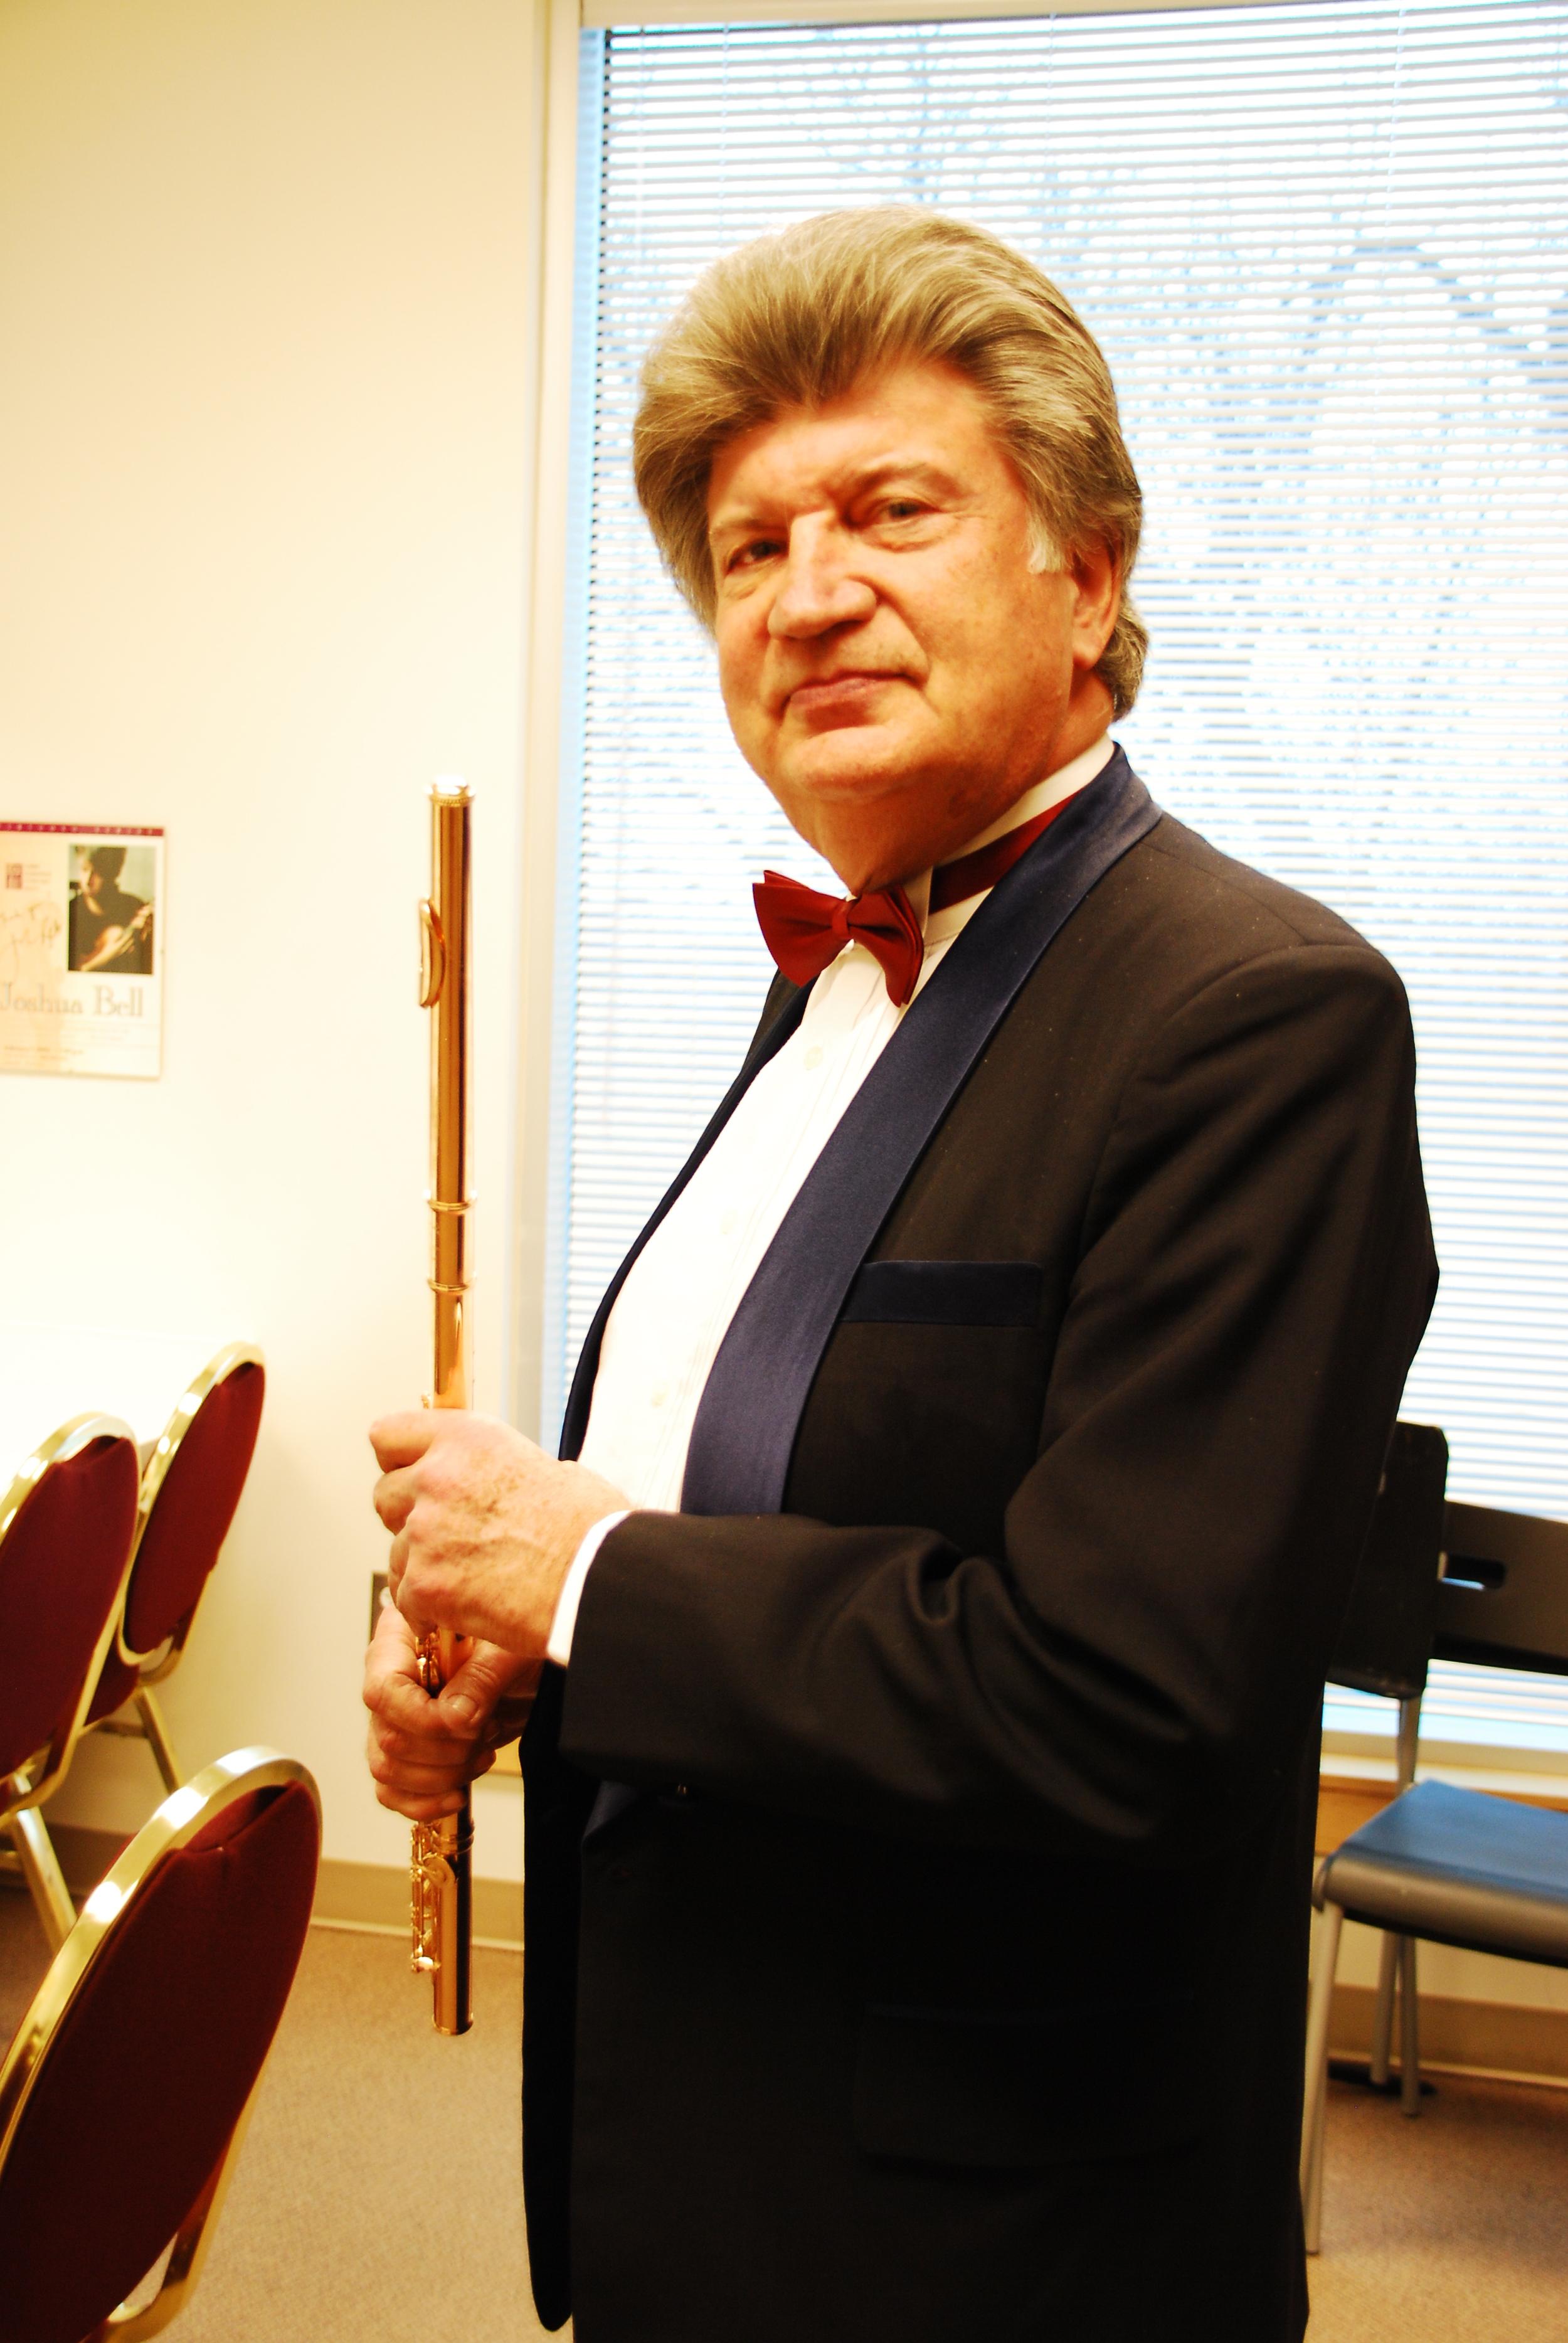 Jean-Michel Tanguy